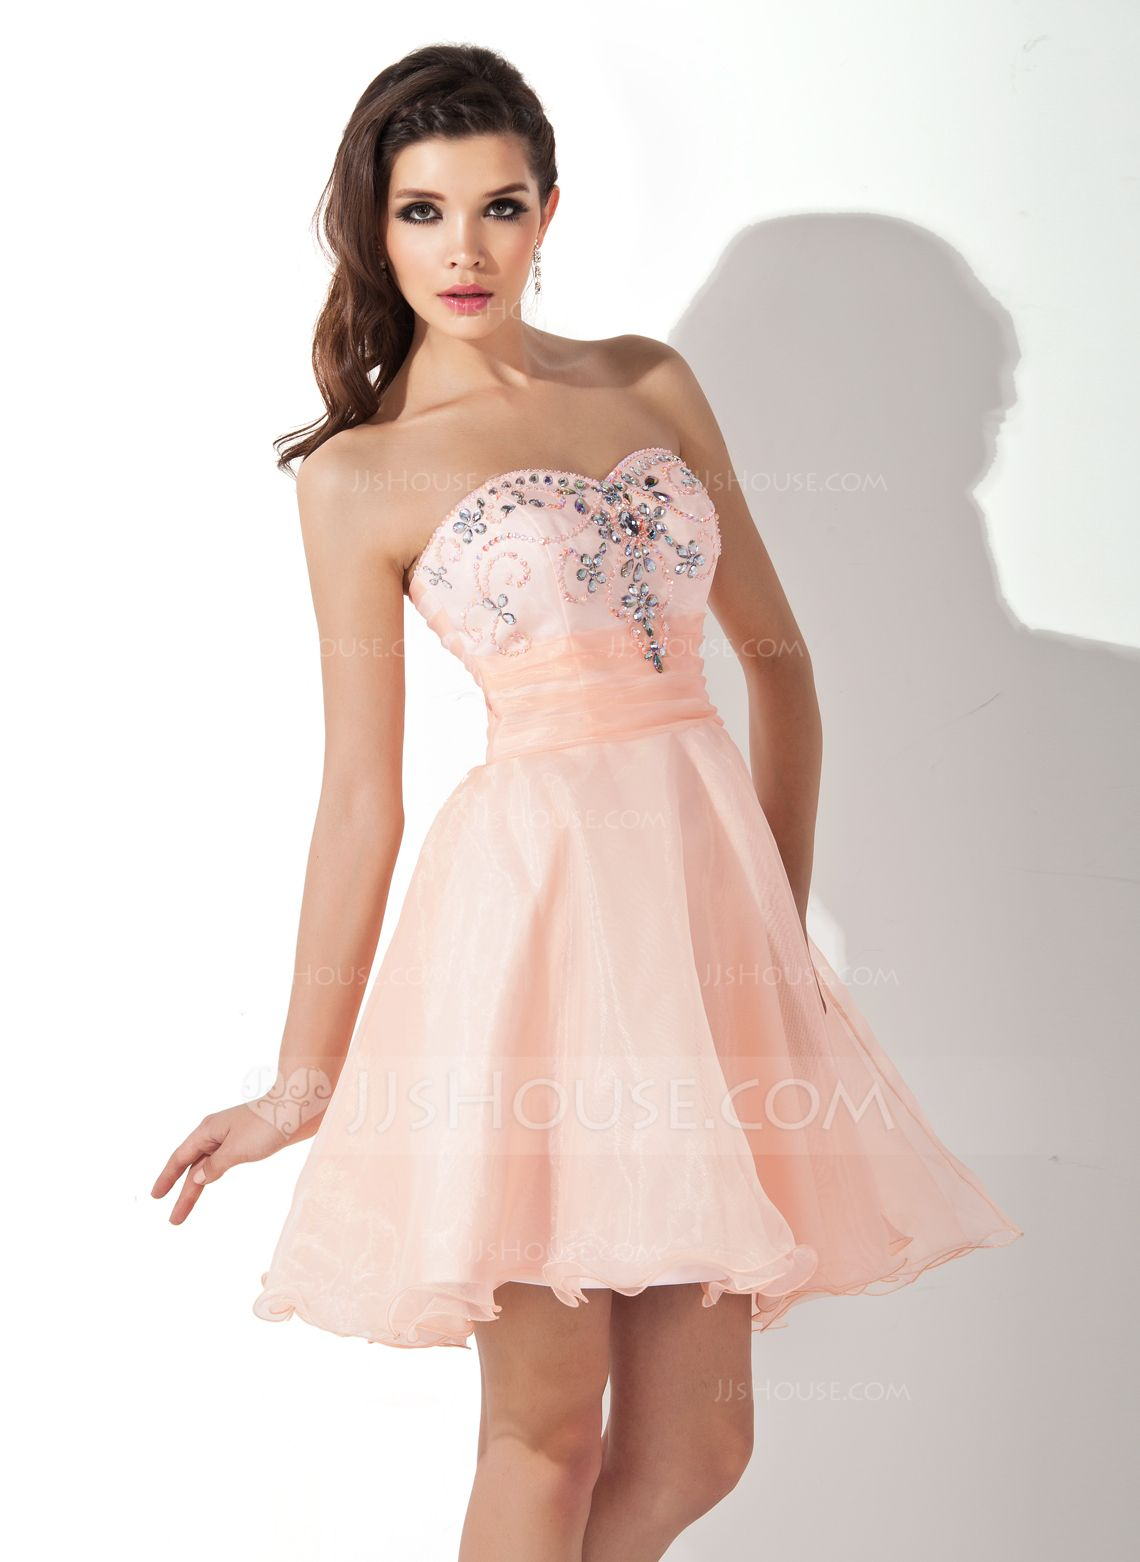 A-Line/Princess Sweetheart Short/Mini Organza Homecoming Dress With Ruffle Beading (022010243) - JJsHouse